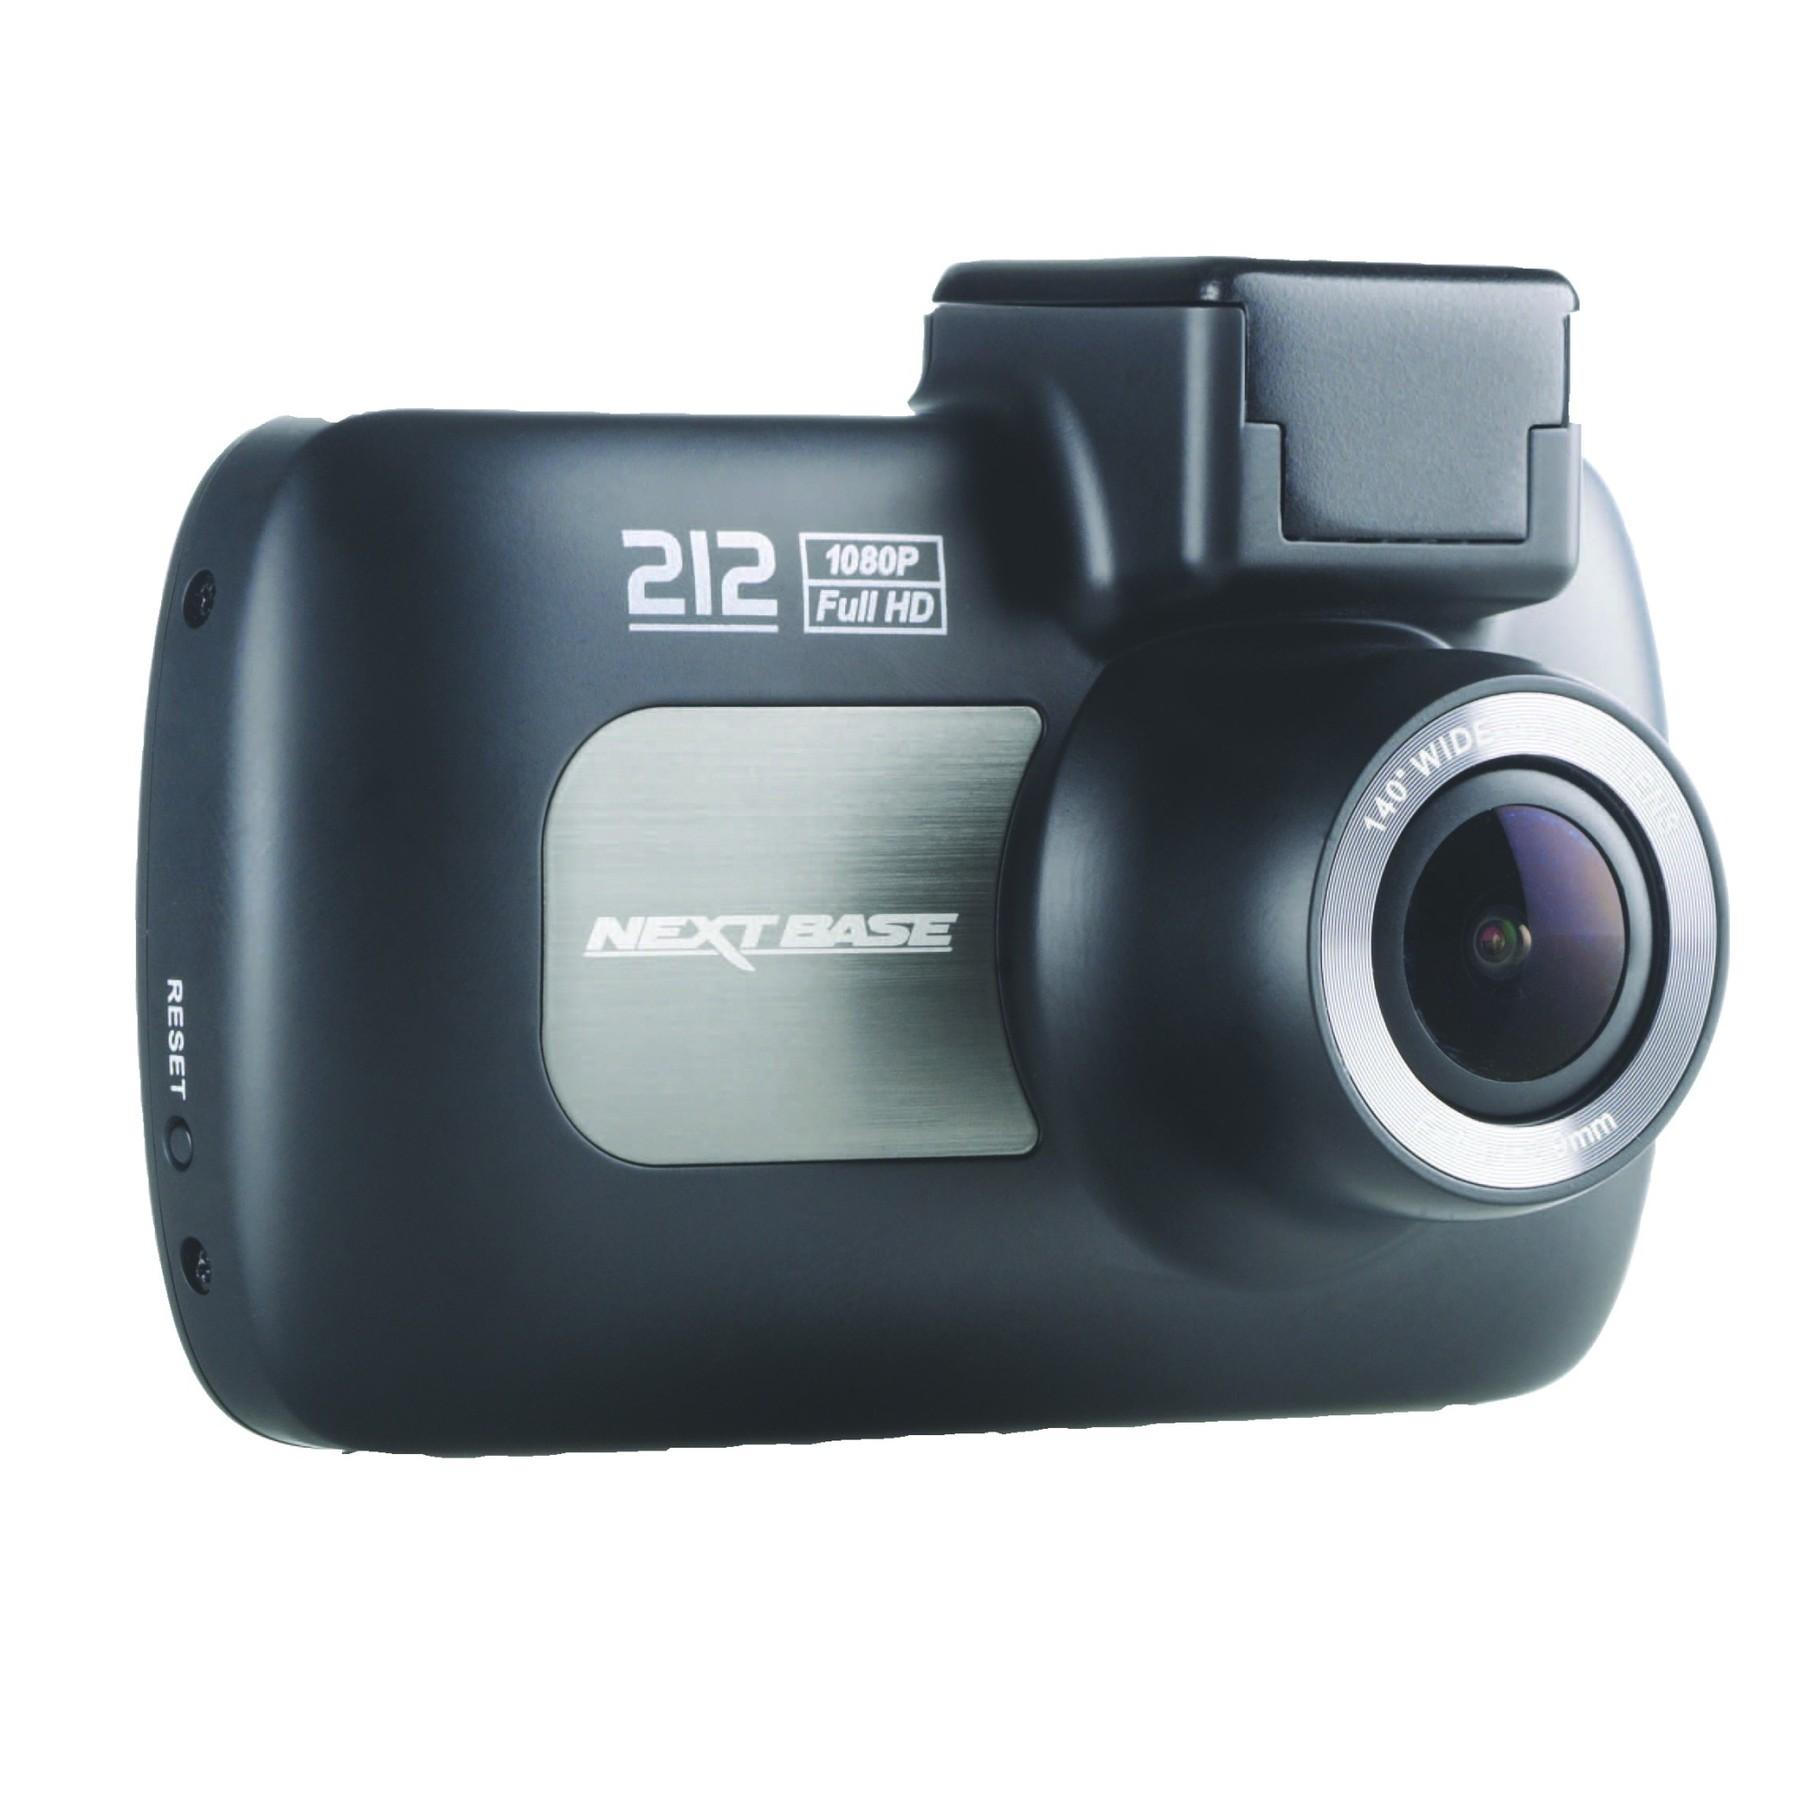 nextbase 212 lite 2 7 g sensor 1080p full hd dash cam in. Black Bedroom Furniture Sets. Home Design Ideas